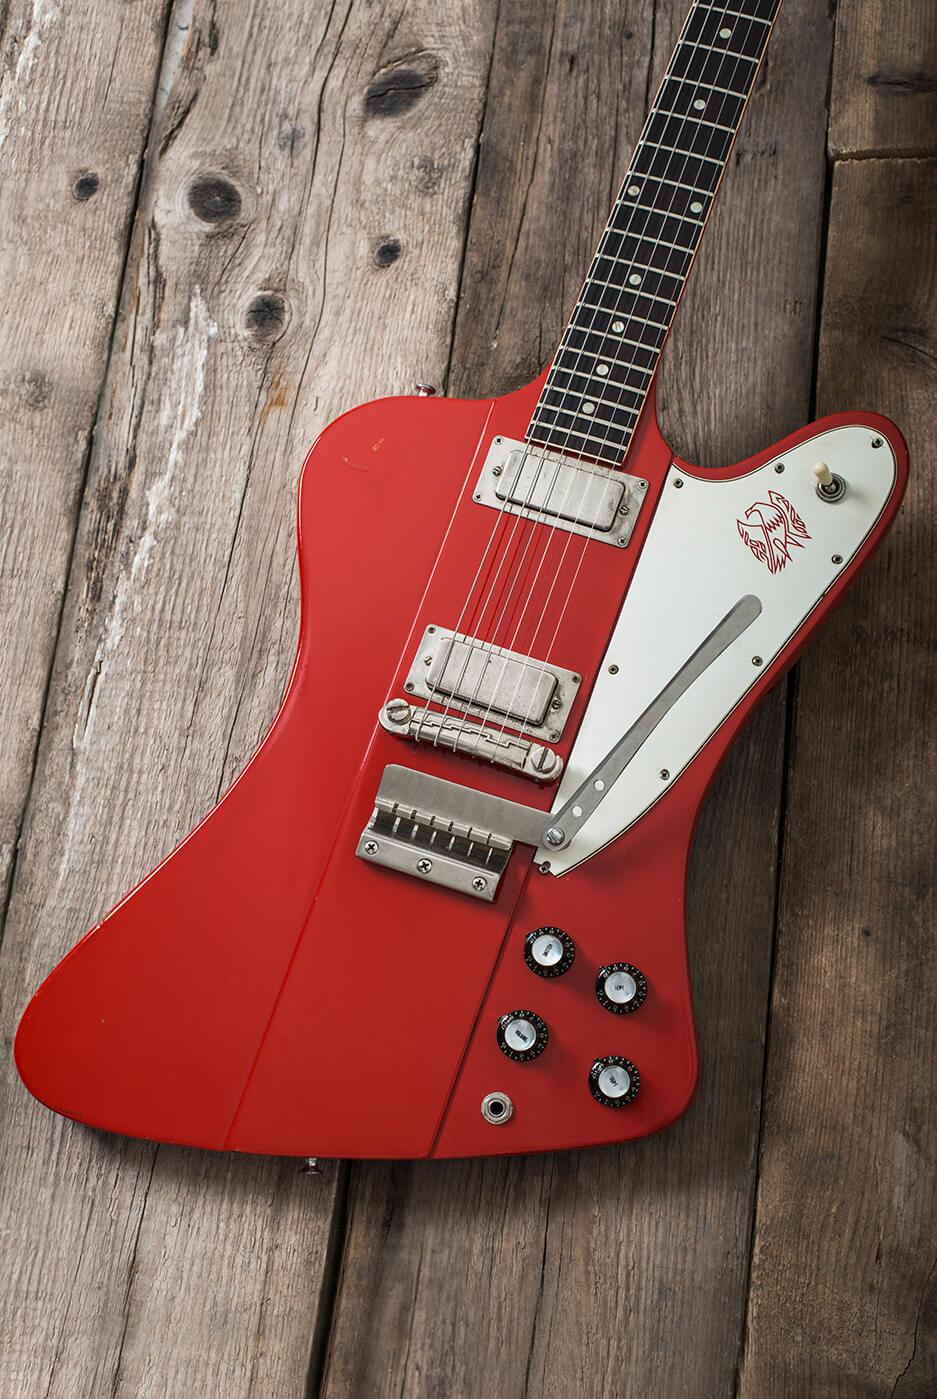 Gibson 1964 Firebird III red portrait on parquet floor